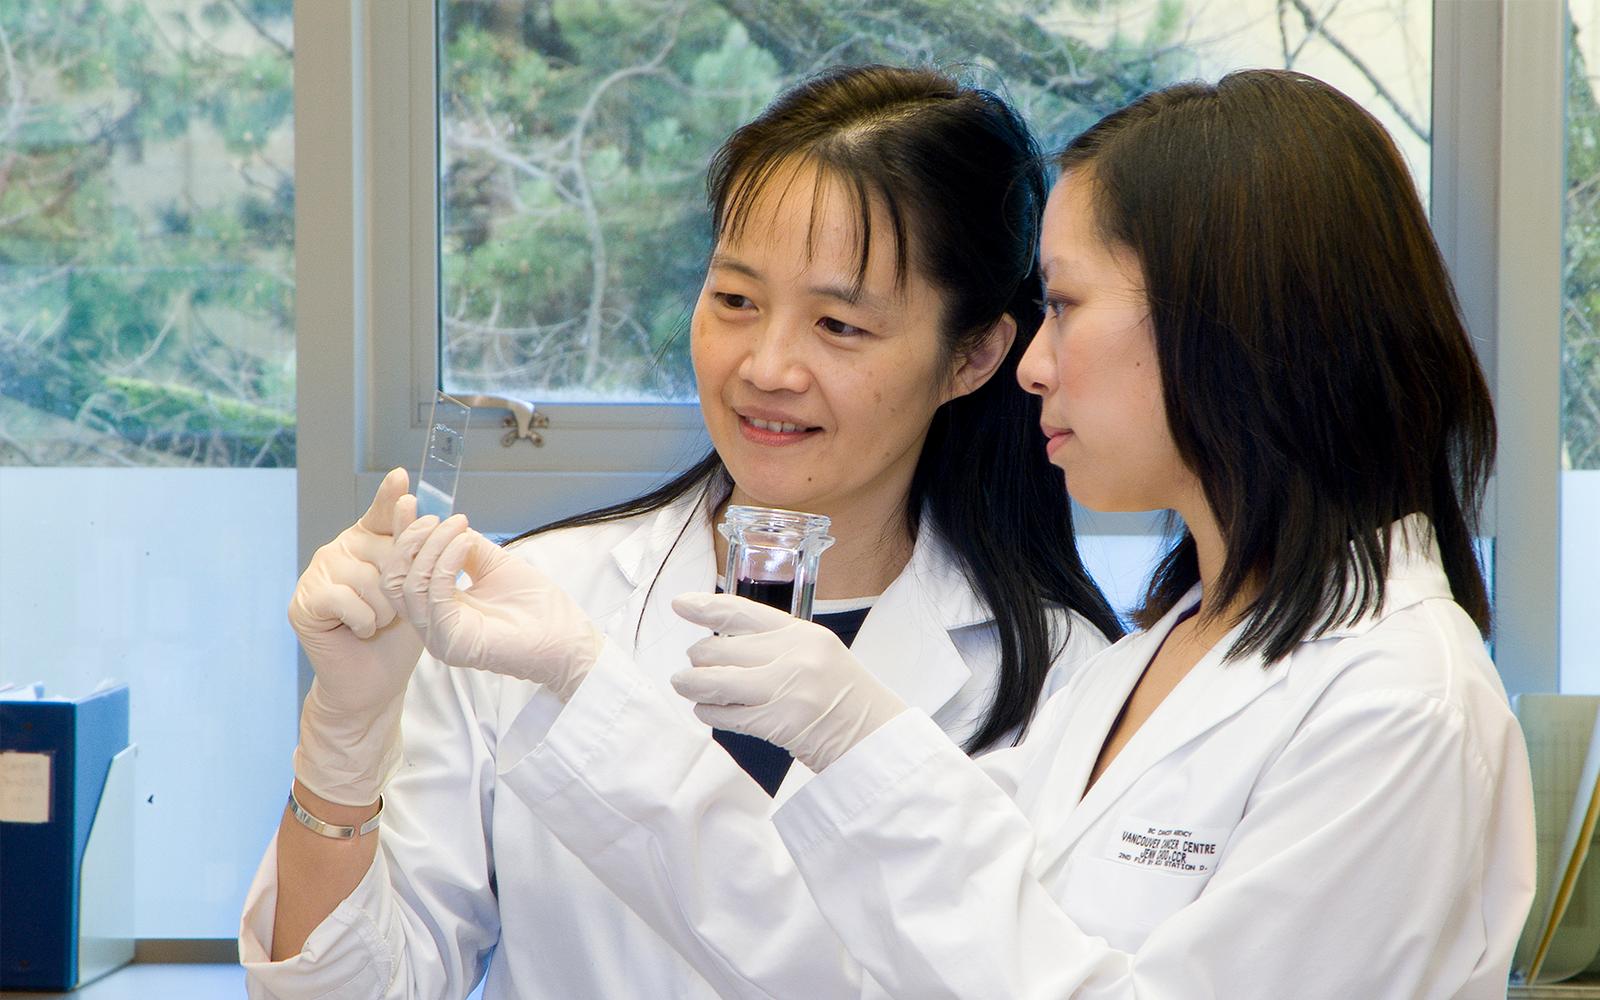 Dr. Catherine Poh